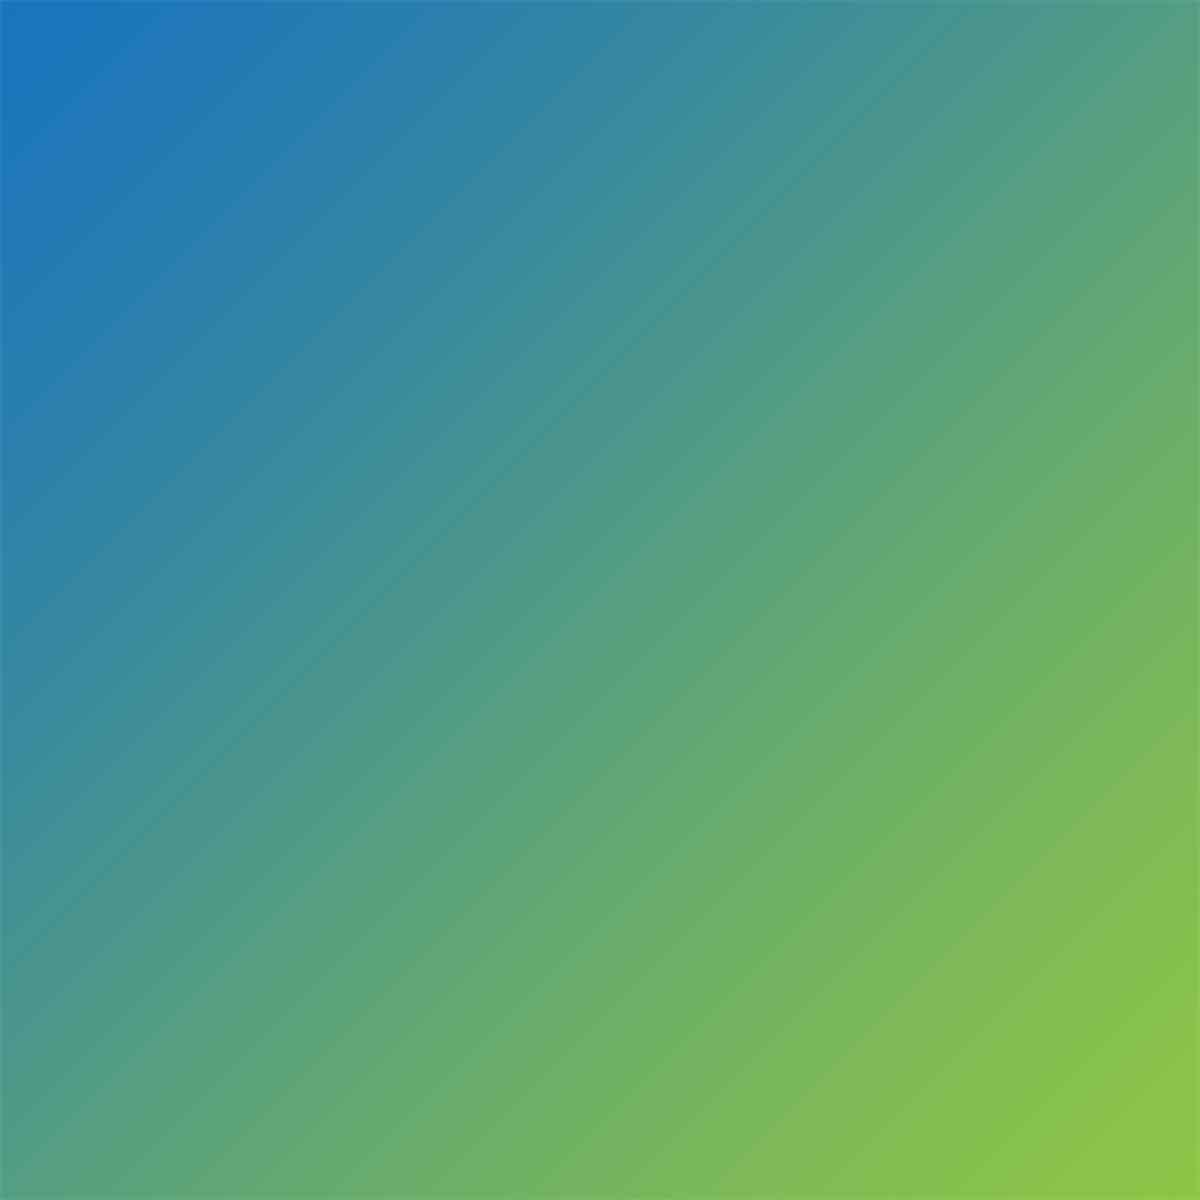 https://www.secomitravel.ro/wp-content/uploads/2018/09/bgn-image-box-gradient.jpg